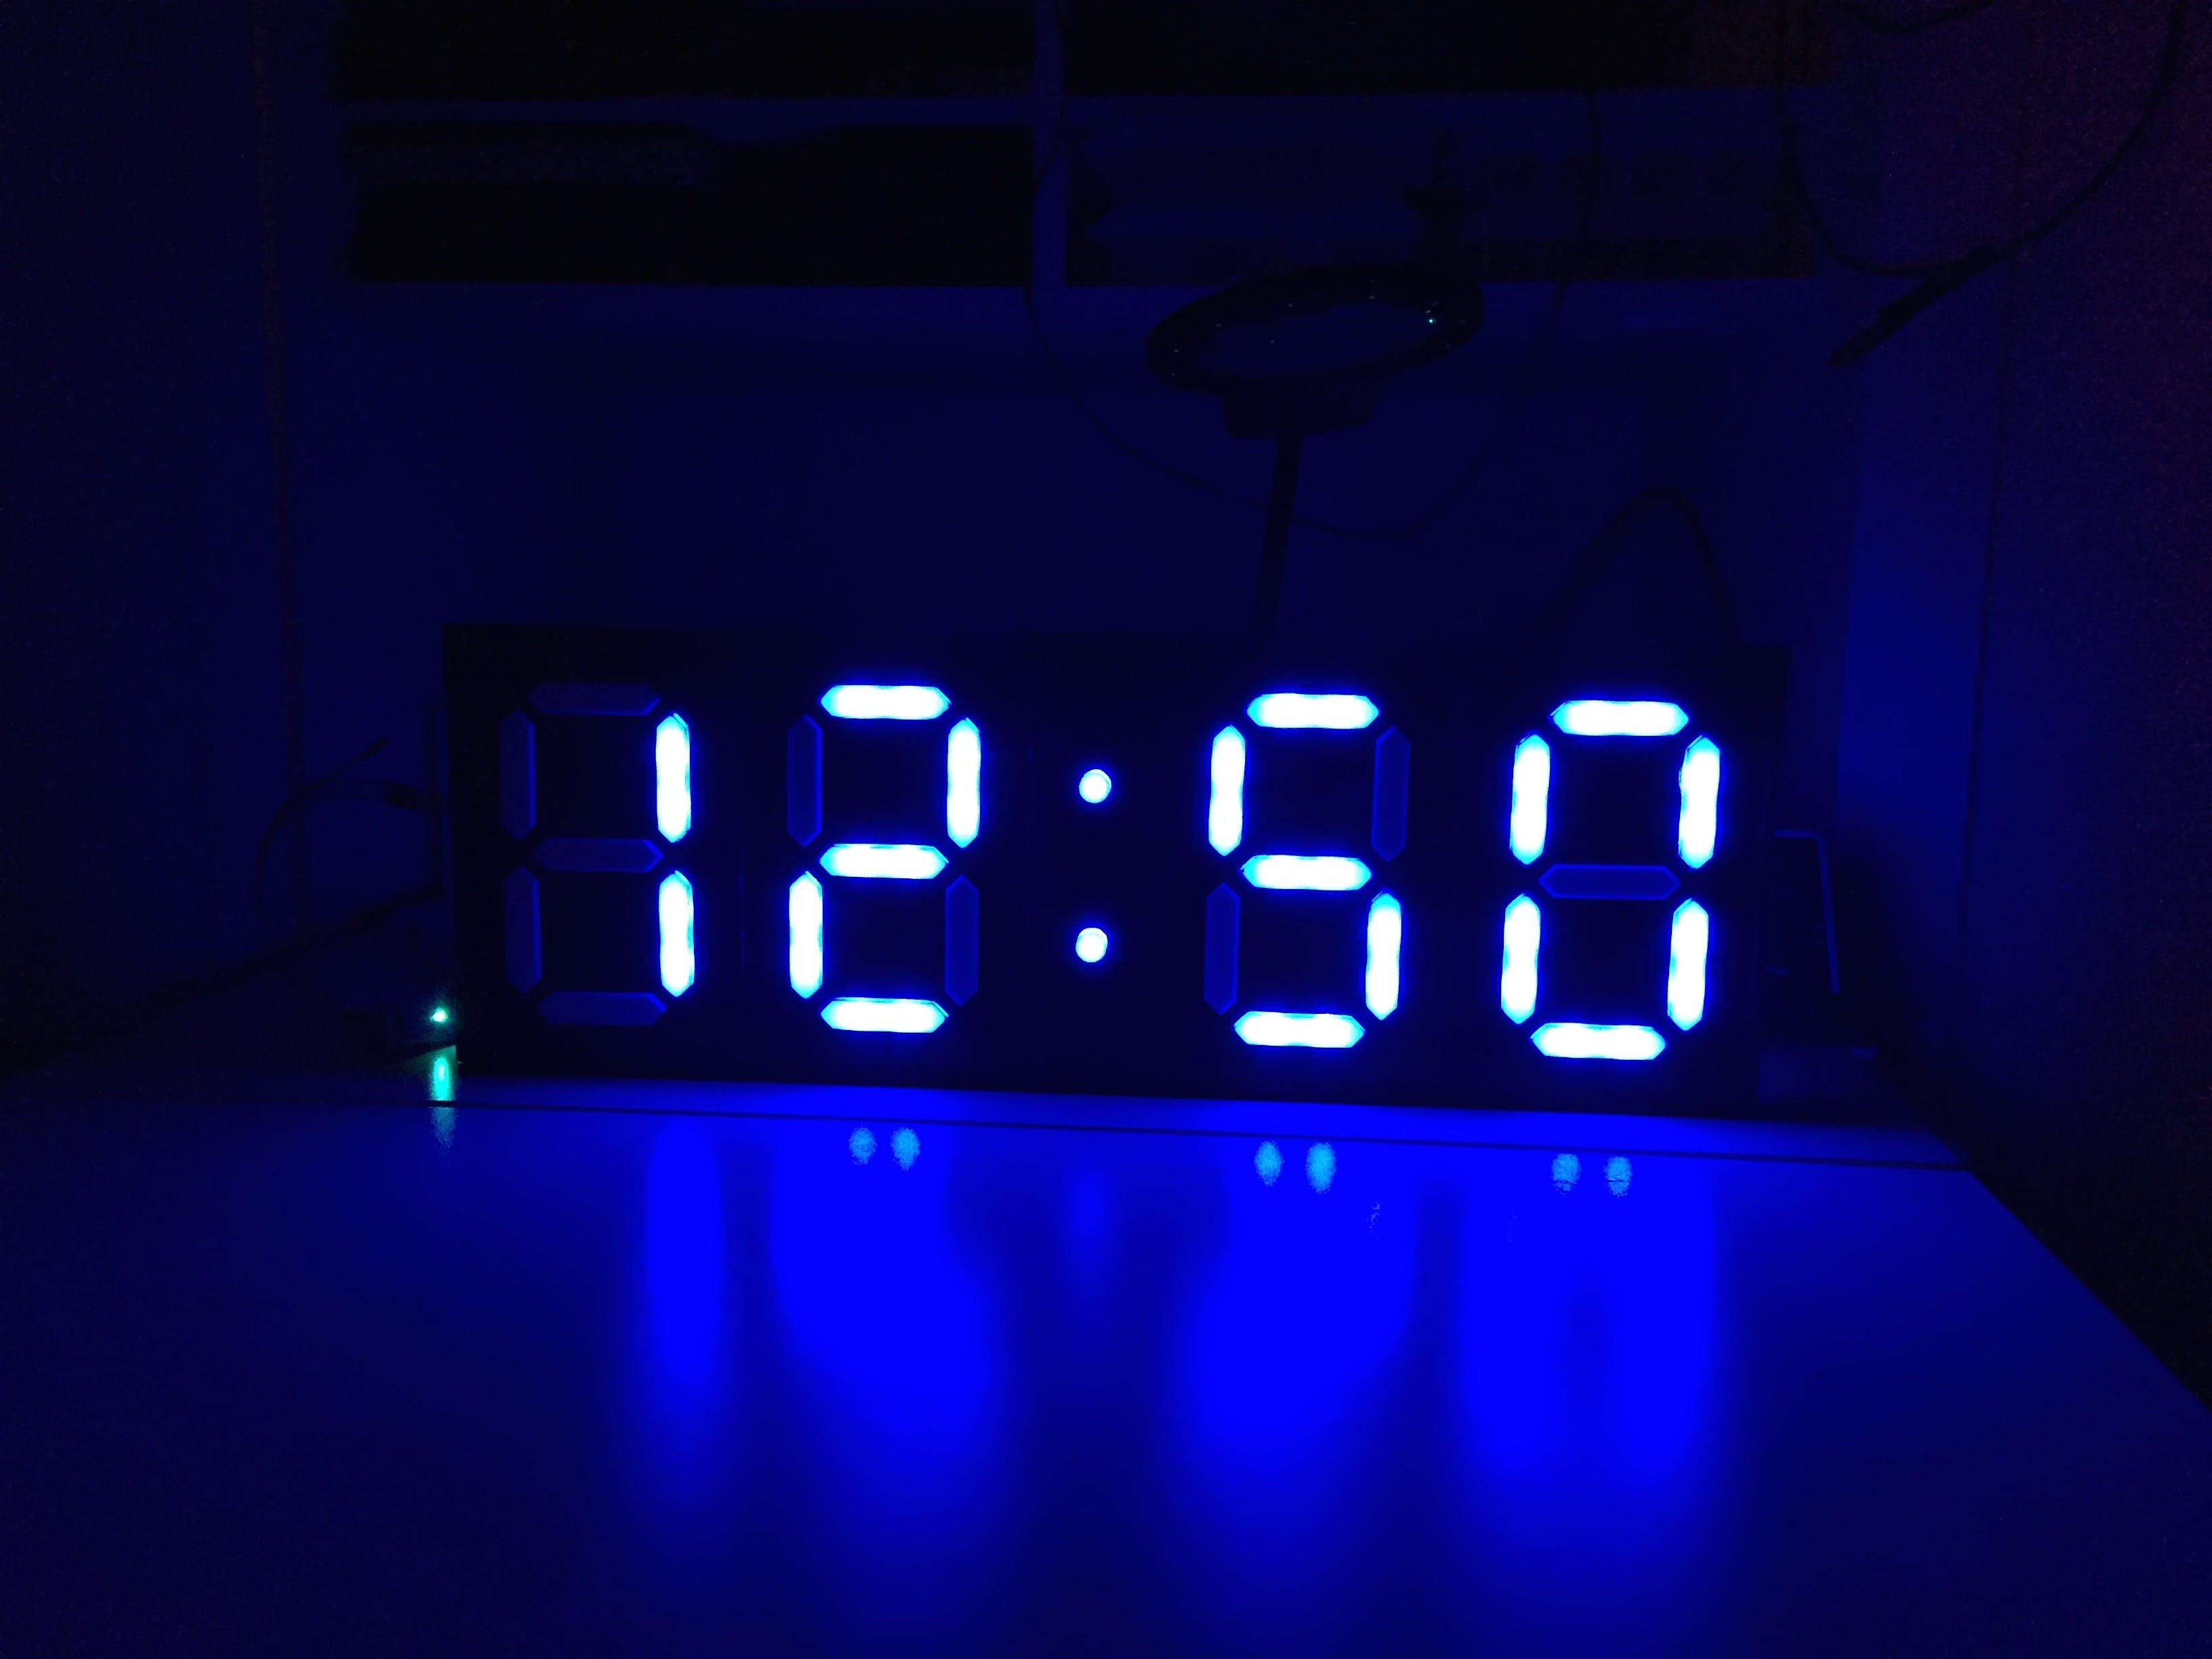 7-Segment Clock